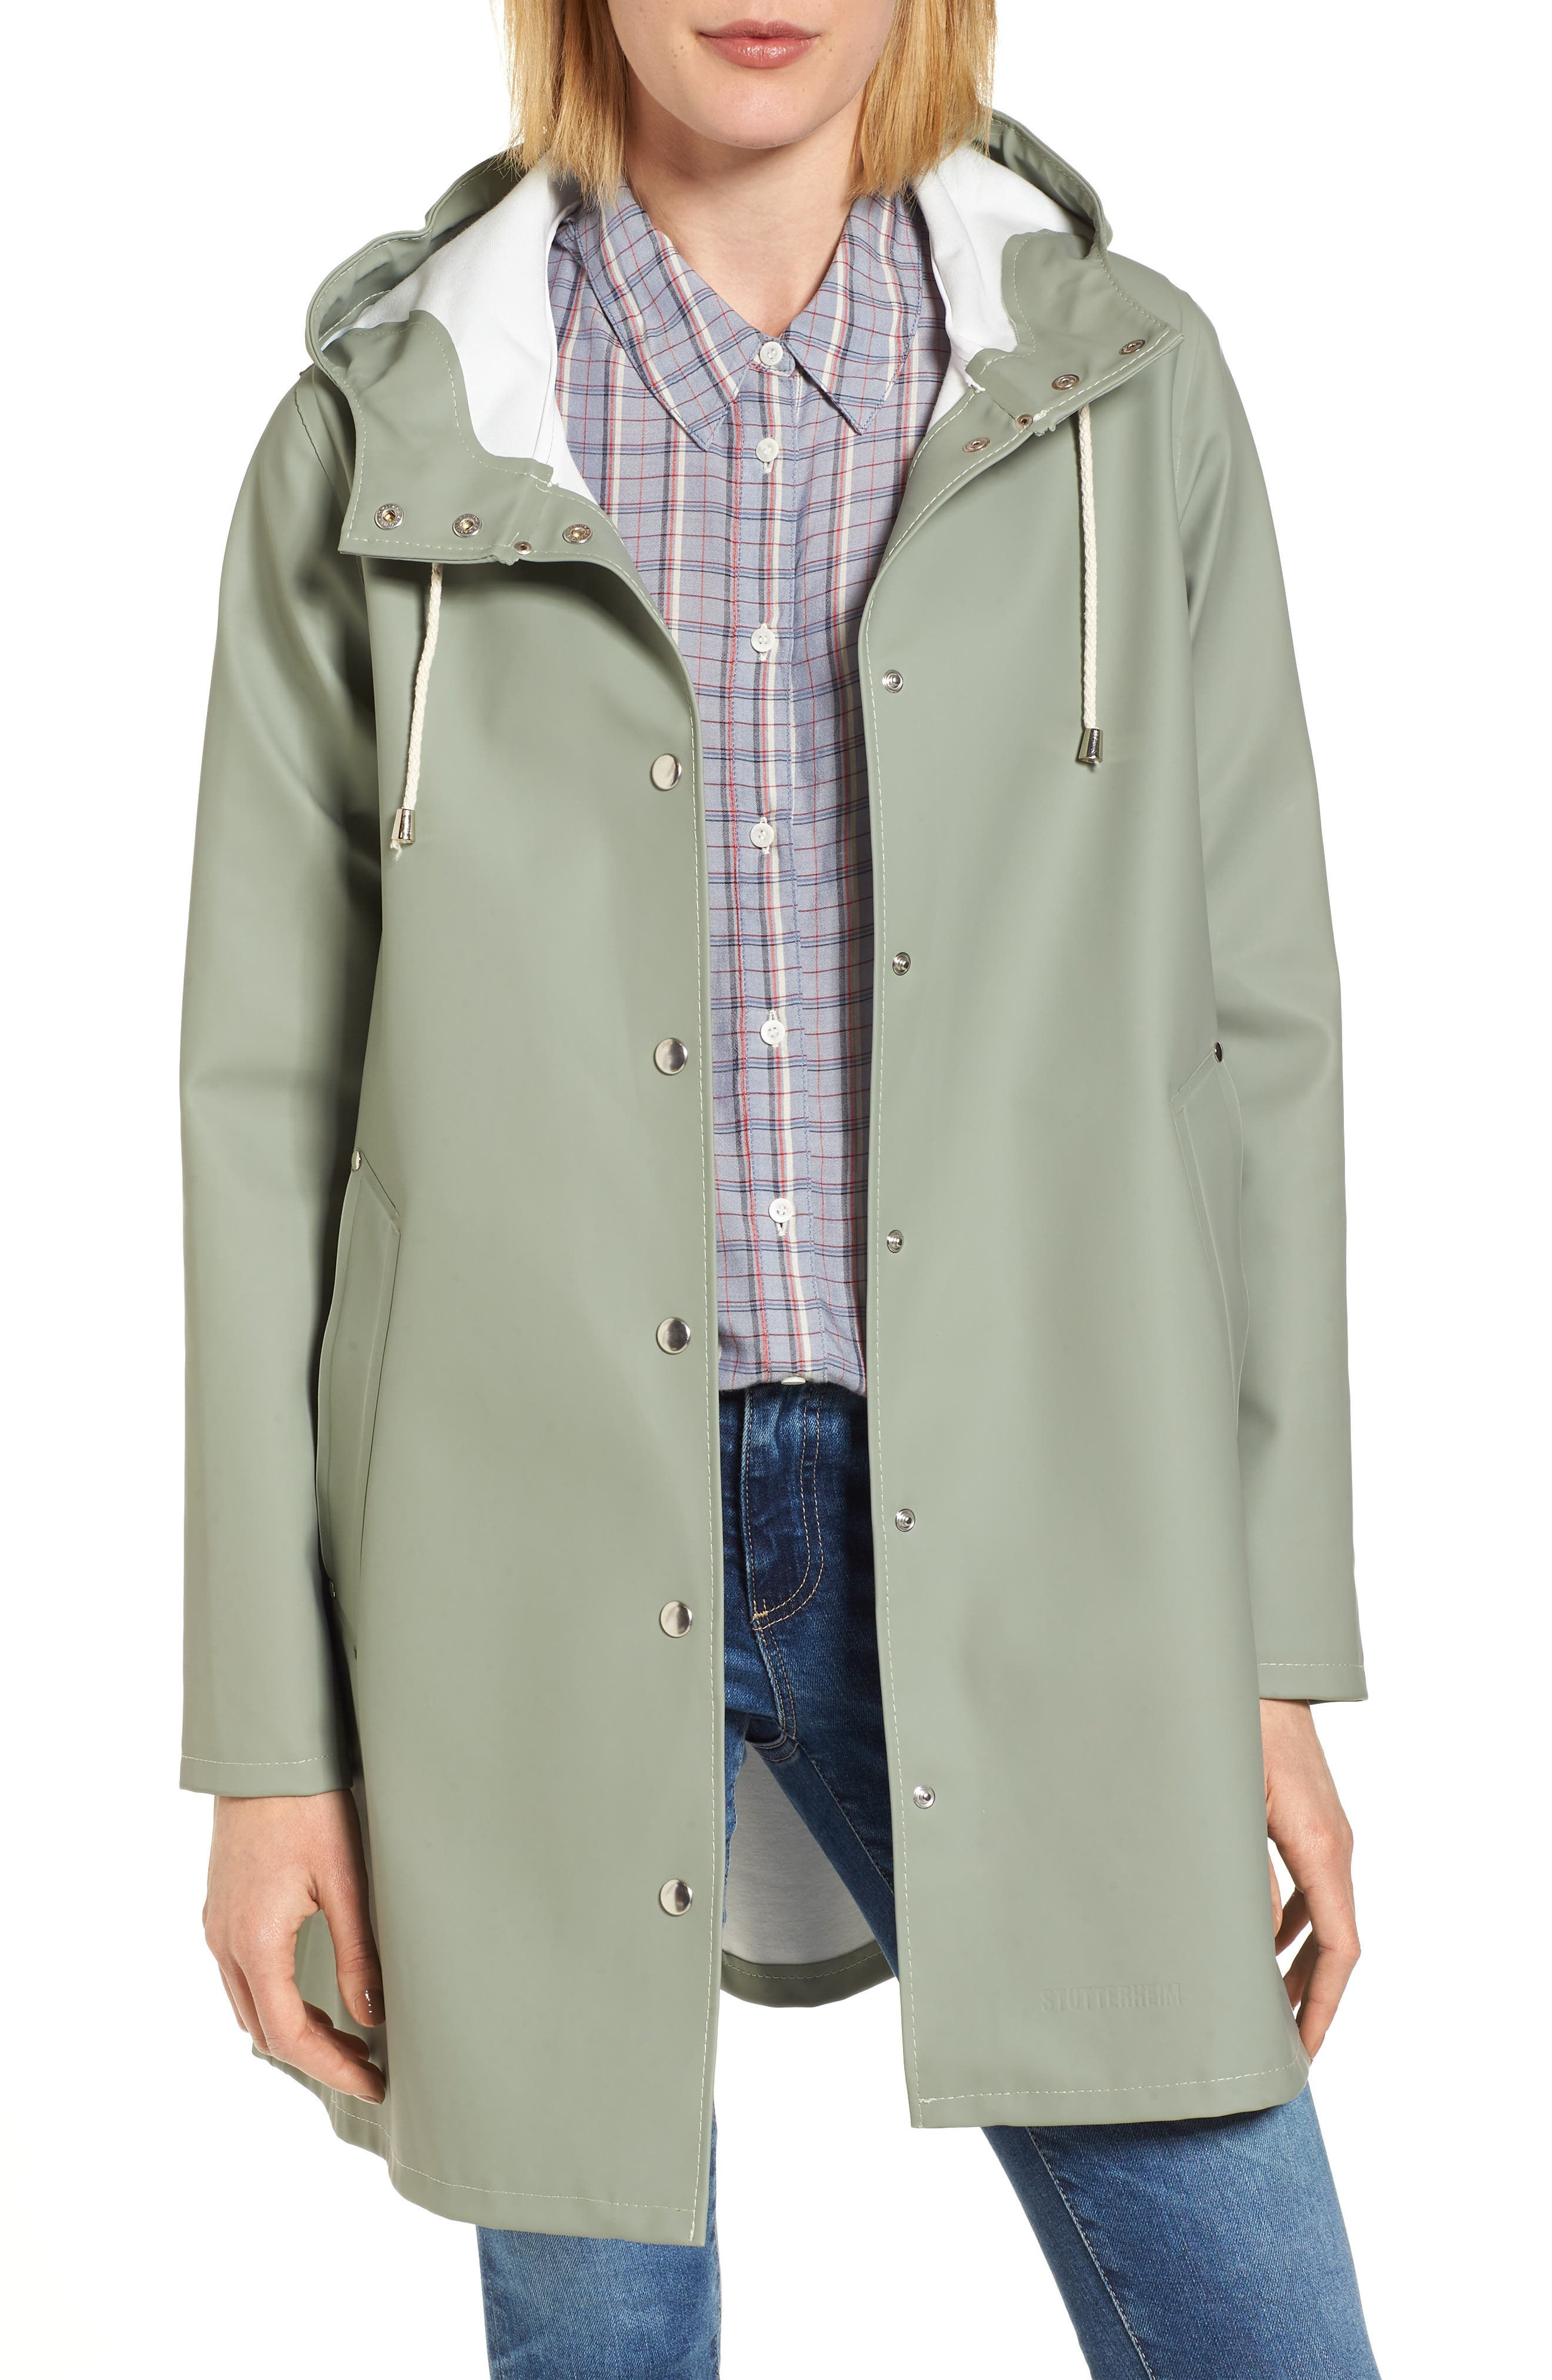 Stutterheim Mosebacke Waterproof A-Line Hooded Raincoat